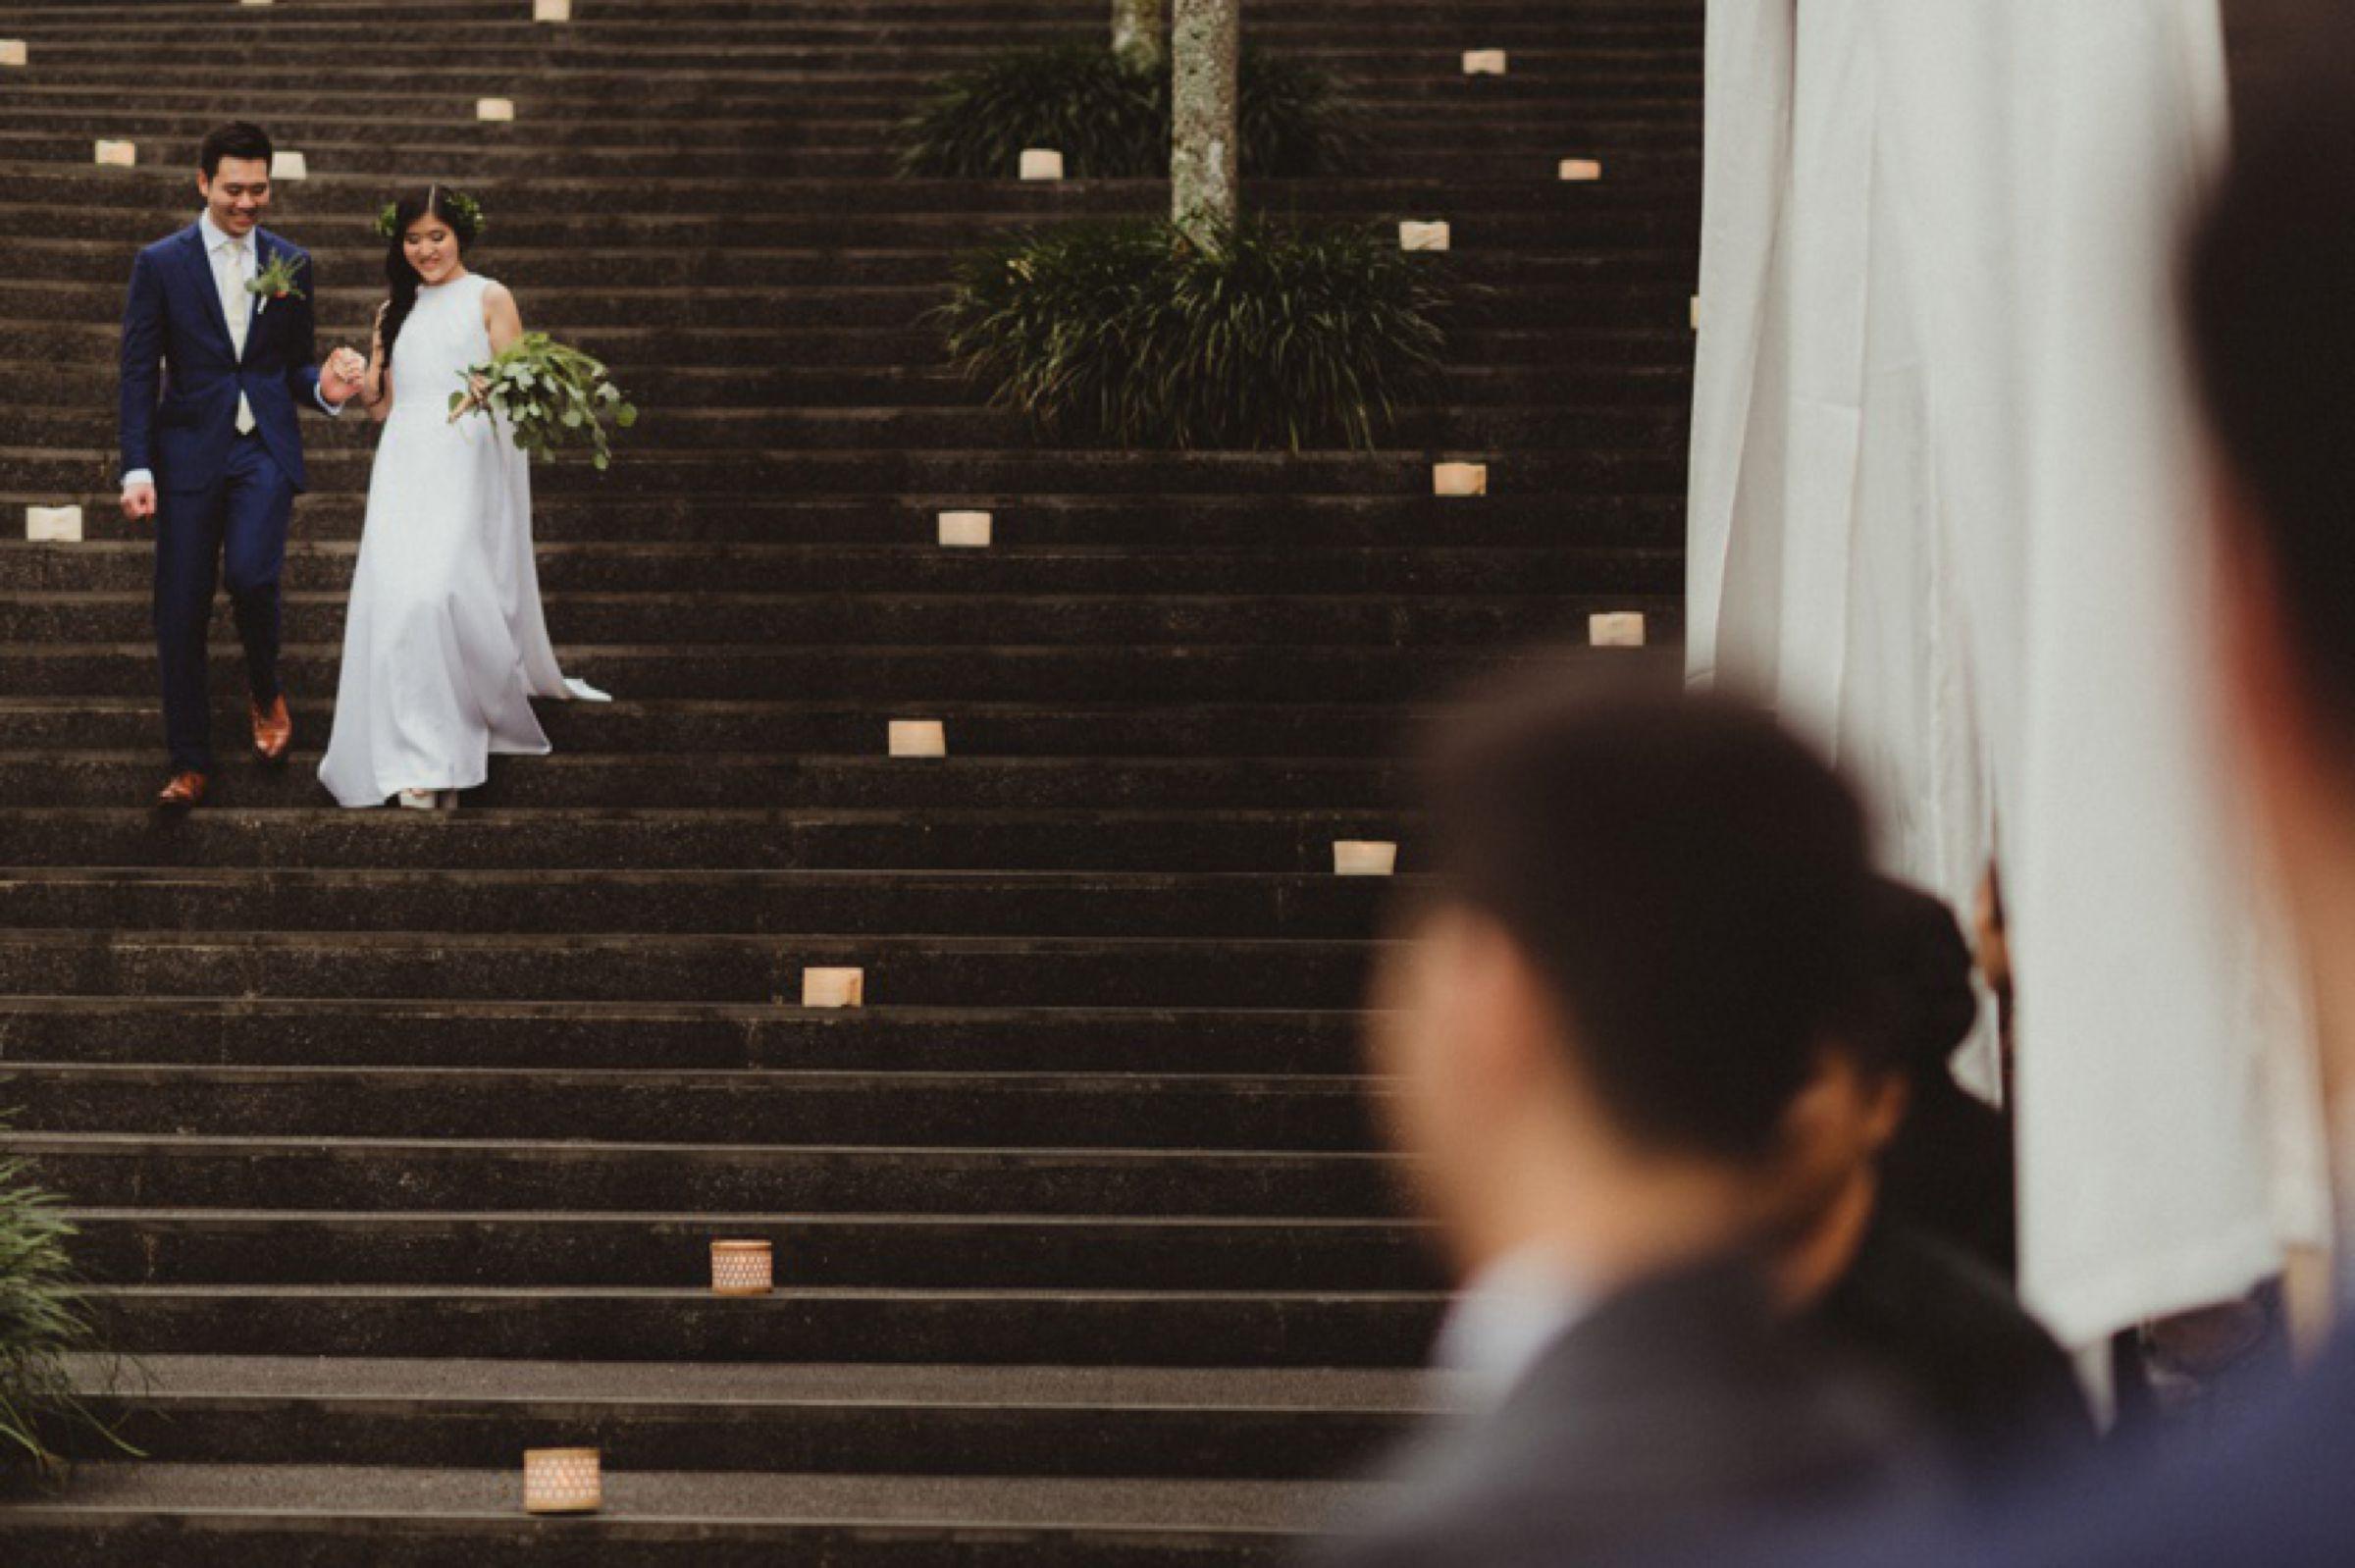 Tim-Danika-Bali-Wedding-Pyara-Photo-Evans 39.jpg